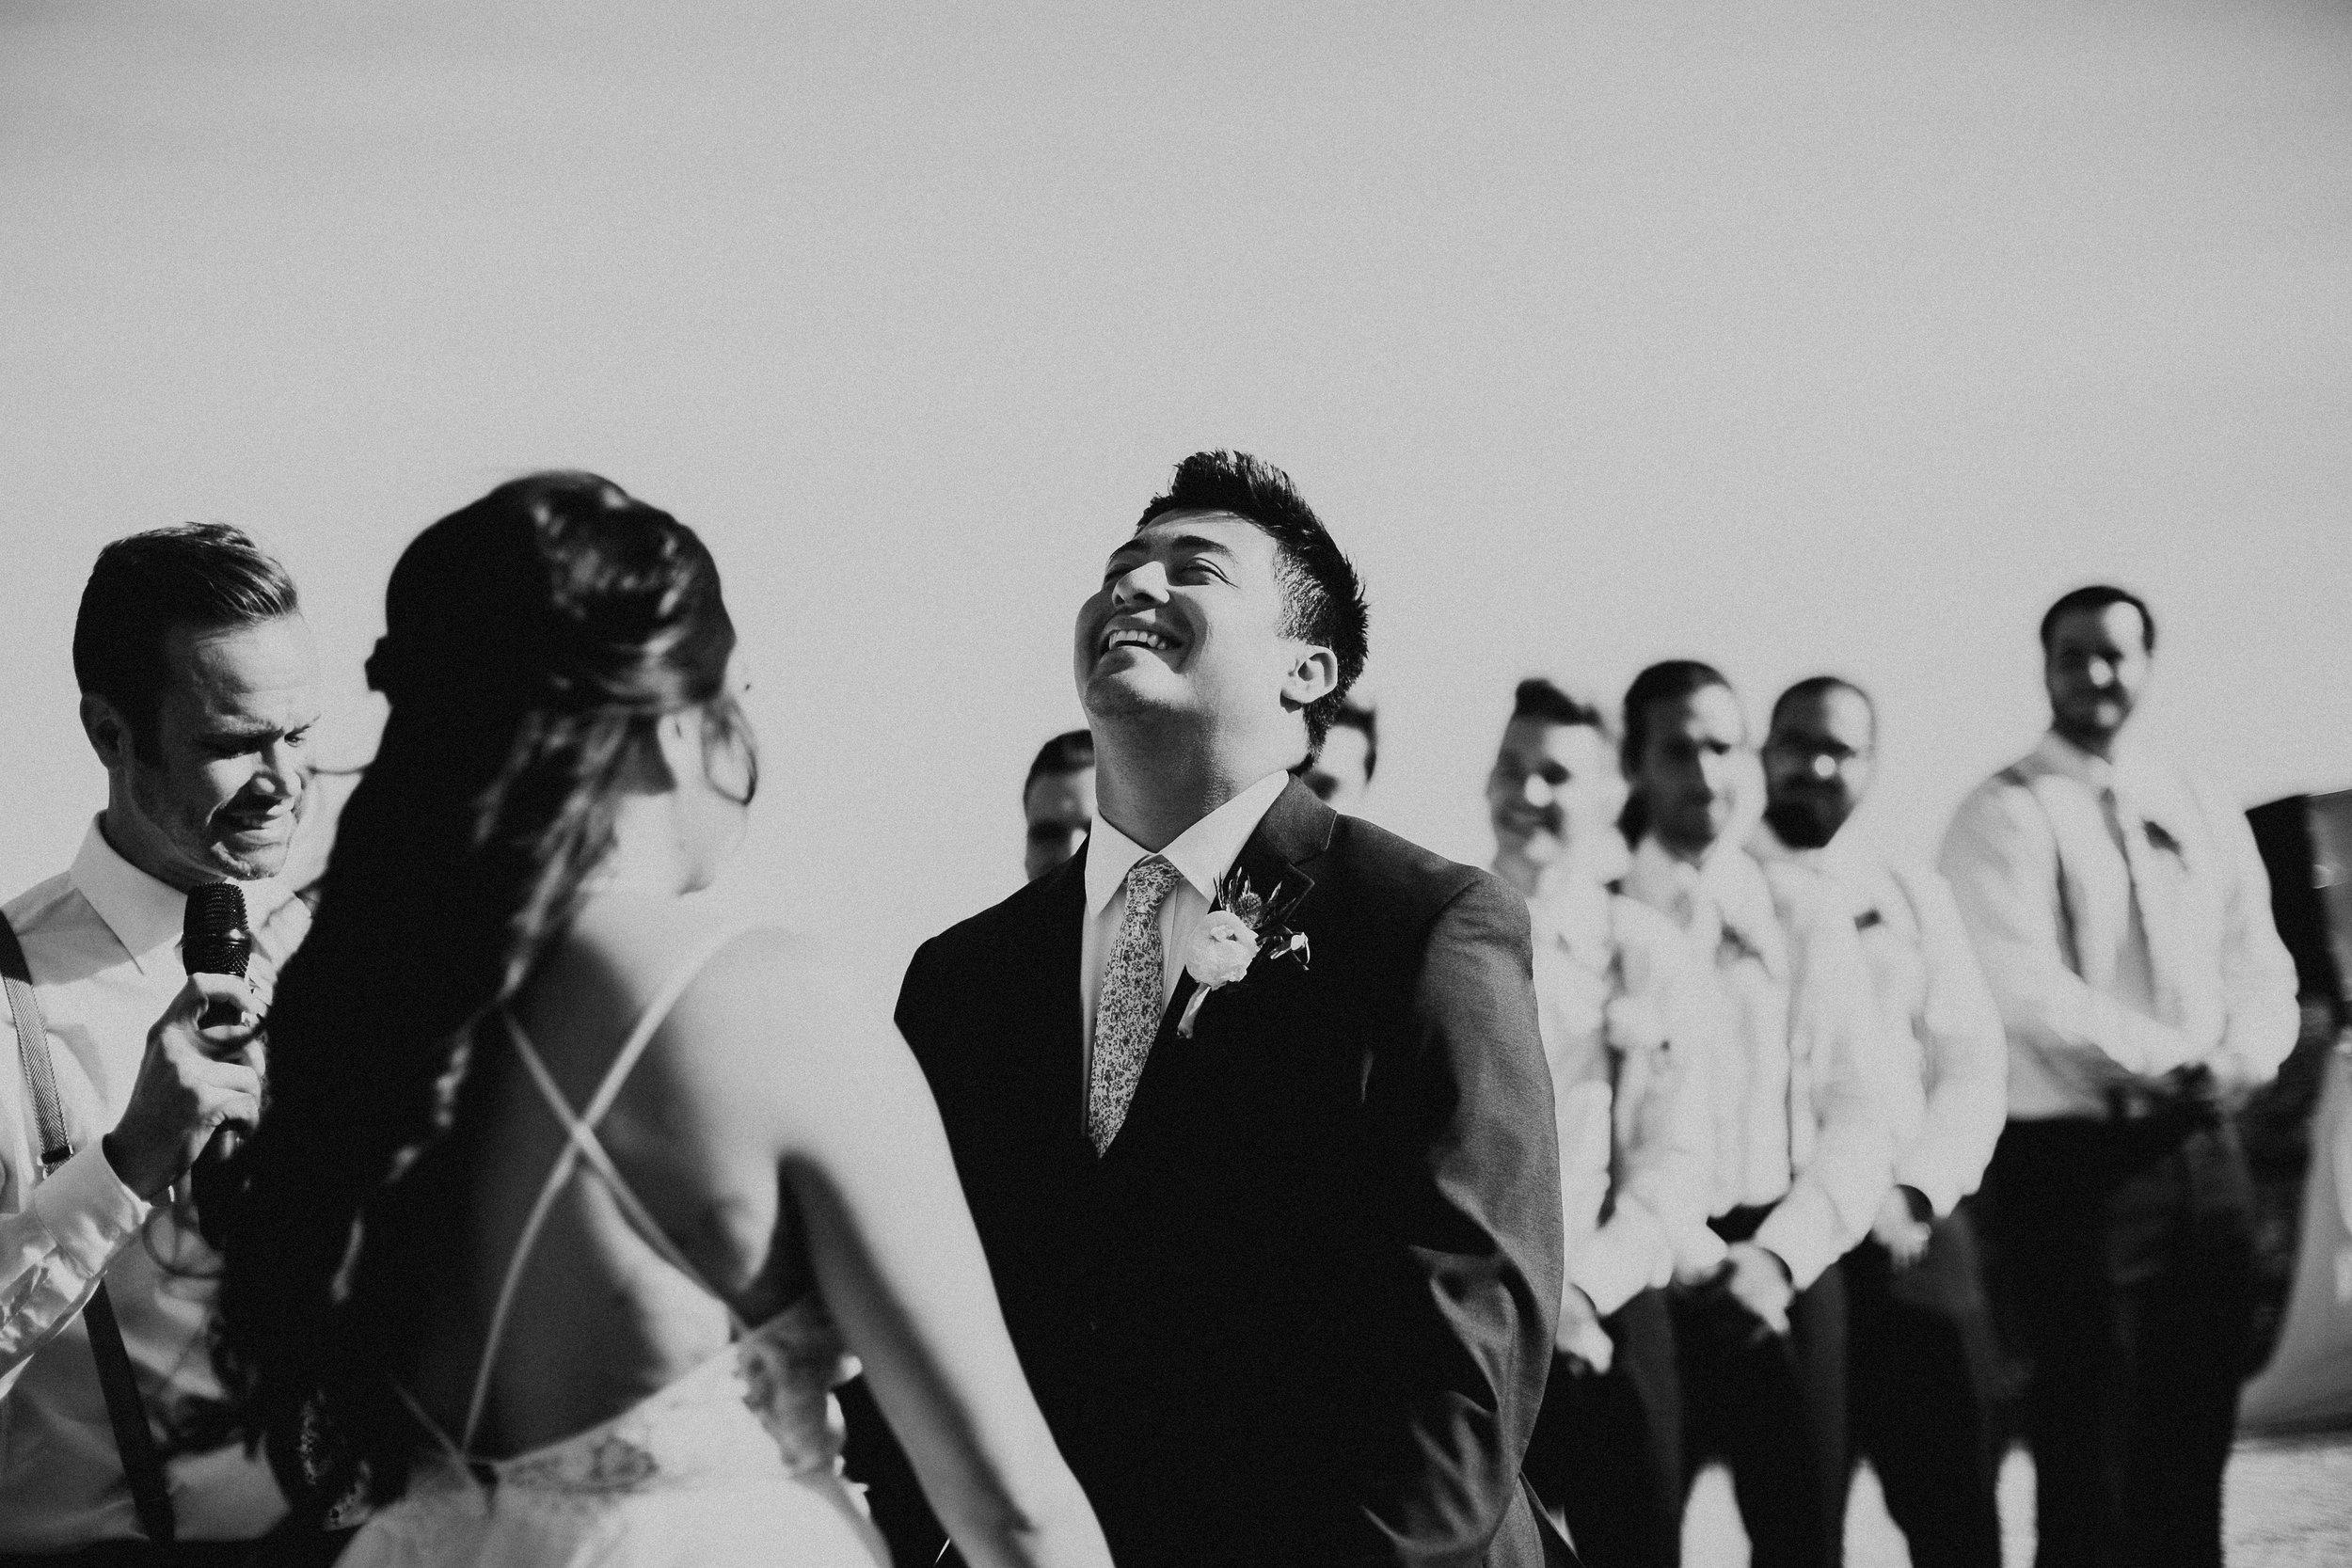 Organic Beachside Santa Barbara Wedding at The Ritz-Carlton Bacara: Shanlyn & Miguel- Konsider It Done- AZ Arizona Wedding & Event Planner, Designer, Coordinator Planning in Scottsdale, Phoenix, Paradise Valley, Tempe, Gilbert, Mesa, Chandler, Tucson, Sedona, California, Cali